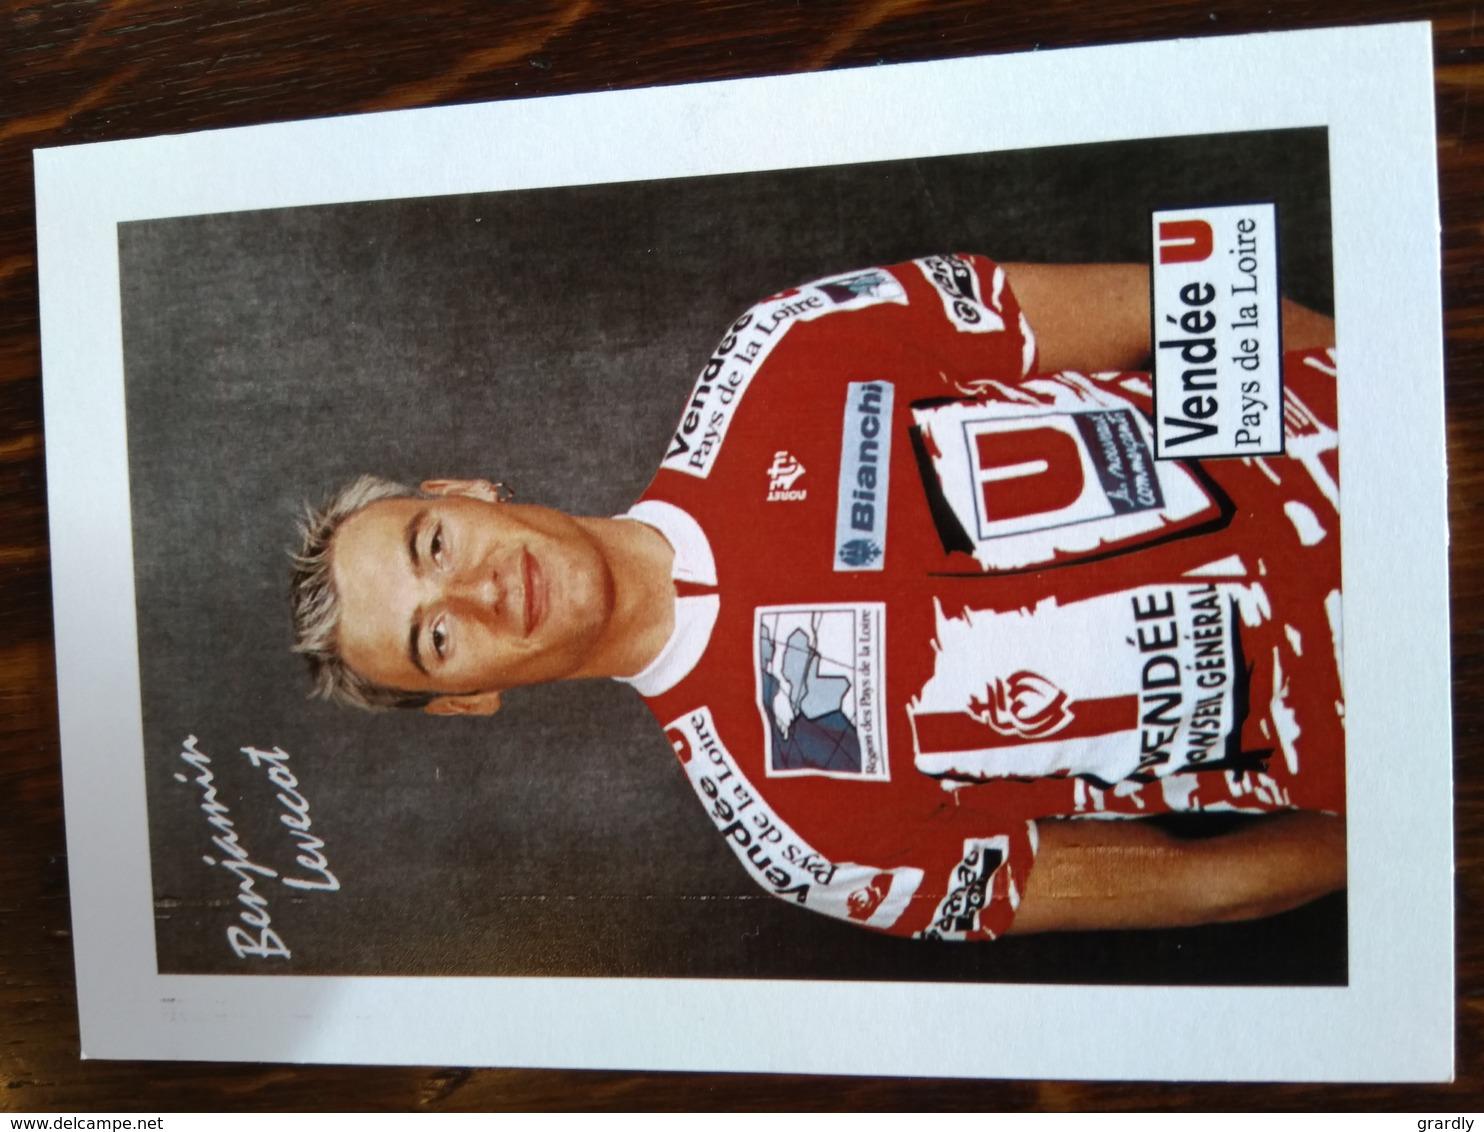 CYCLISME LEVECOT Benjamin VENDEE U 1999 - Cyclisme